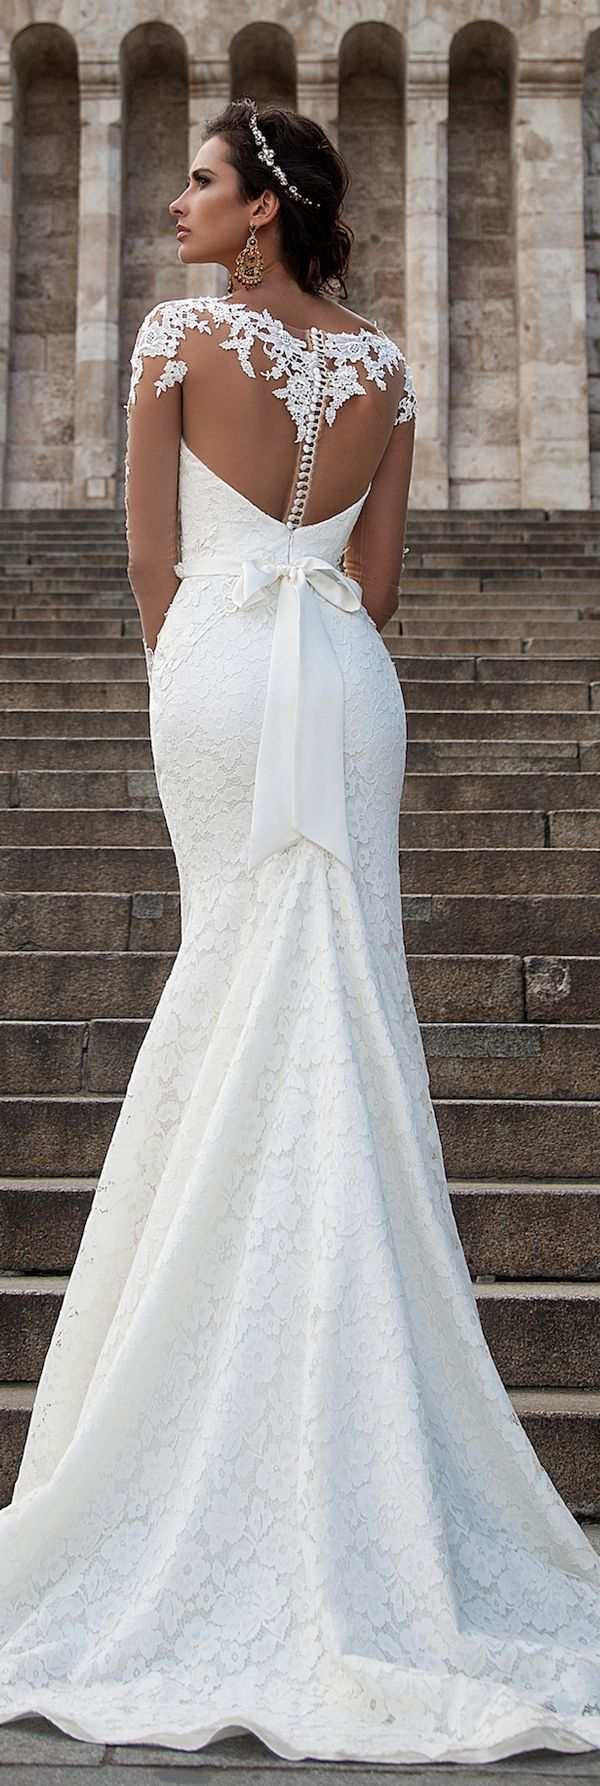 milla nova 2016 bridal wedding dresses ivon 2